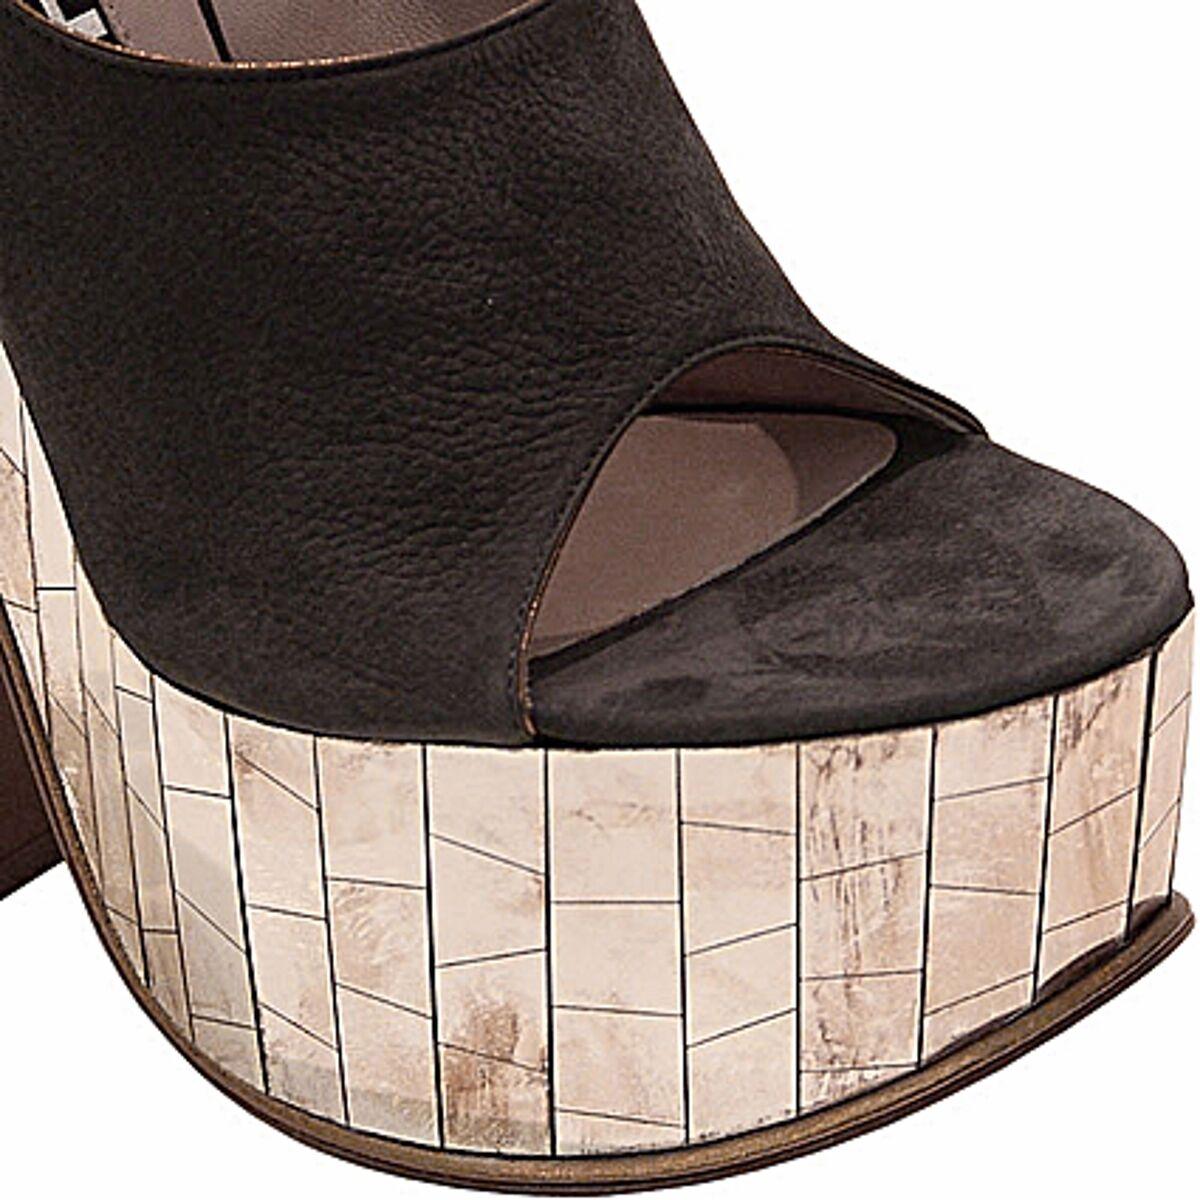 Rochas Rochas Rochas Wedge sandal Claudine, Claudine platform SIZE 40 b254de